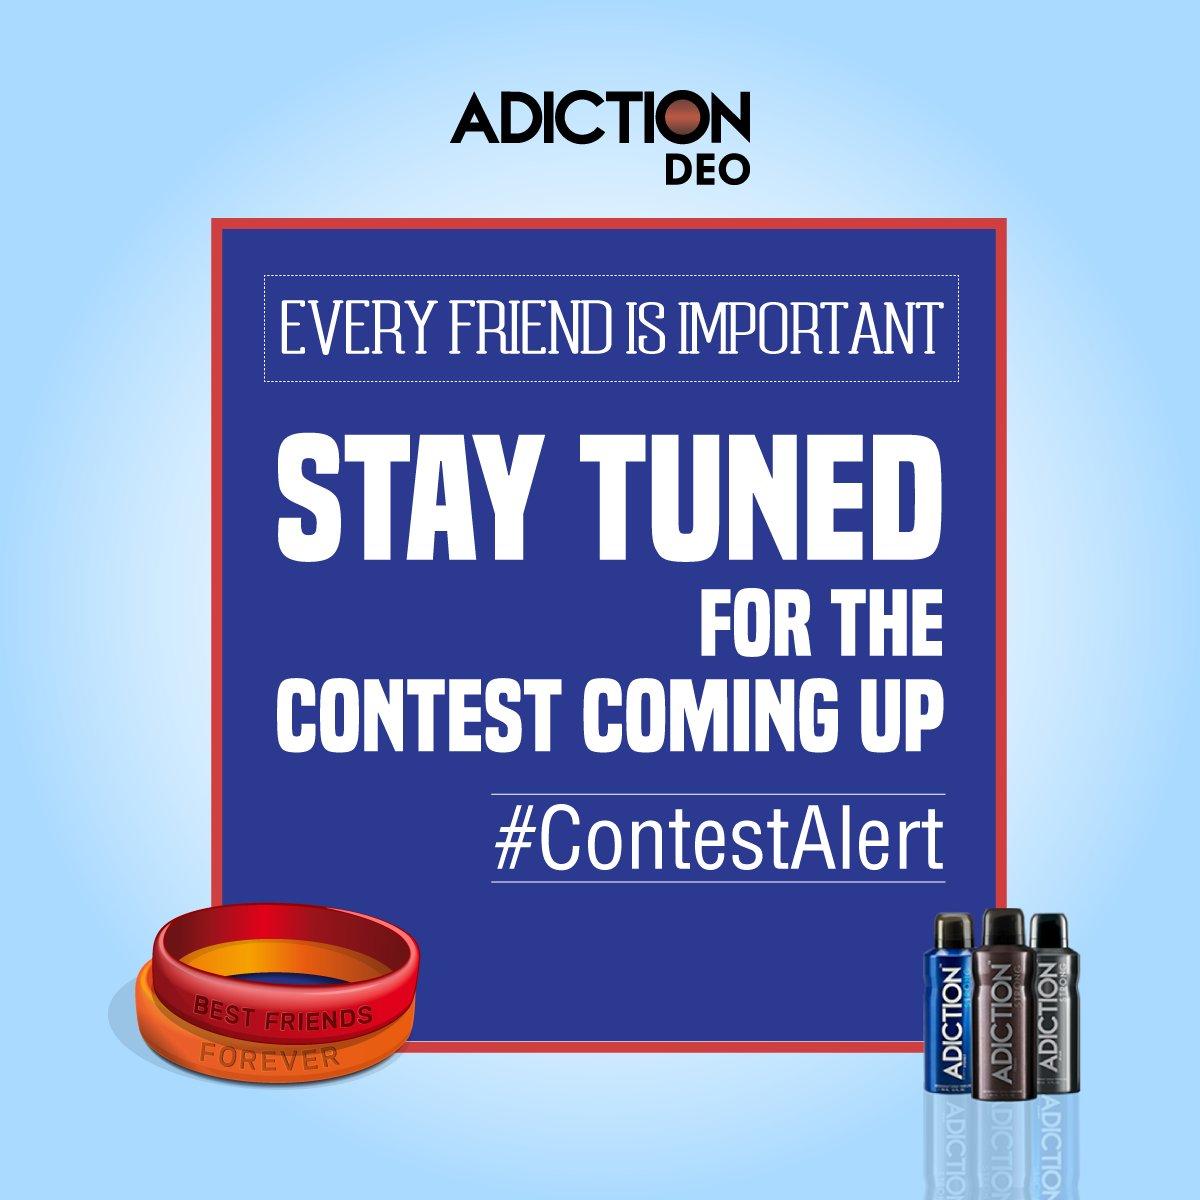 One Day to go! Stay Tuned! #Adiction #Contest #ContestAlert #CelebrateFriendship https://t.co/8FZDdSzMN6